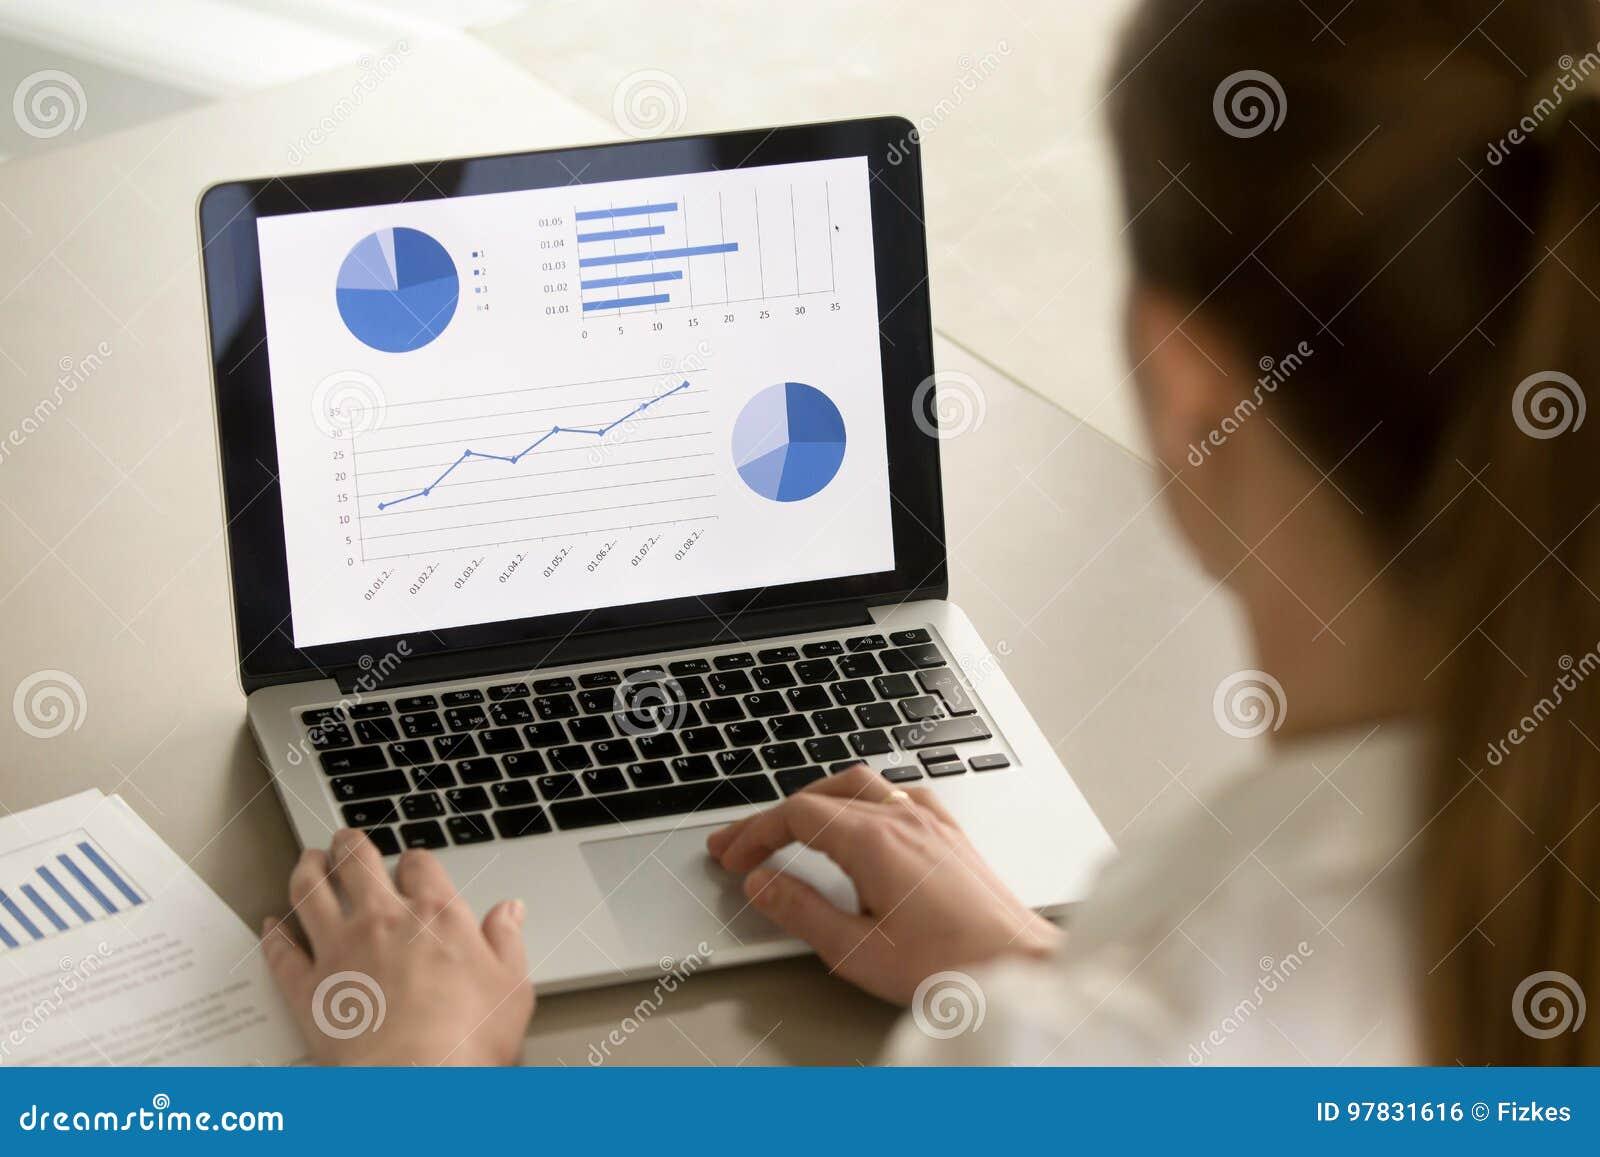 Businesswoman working on laptop, analyzing statistics, software